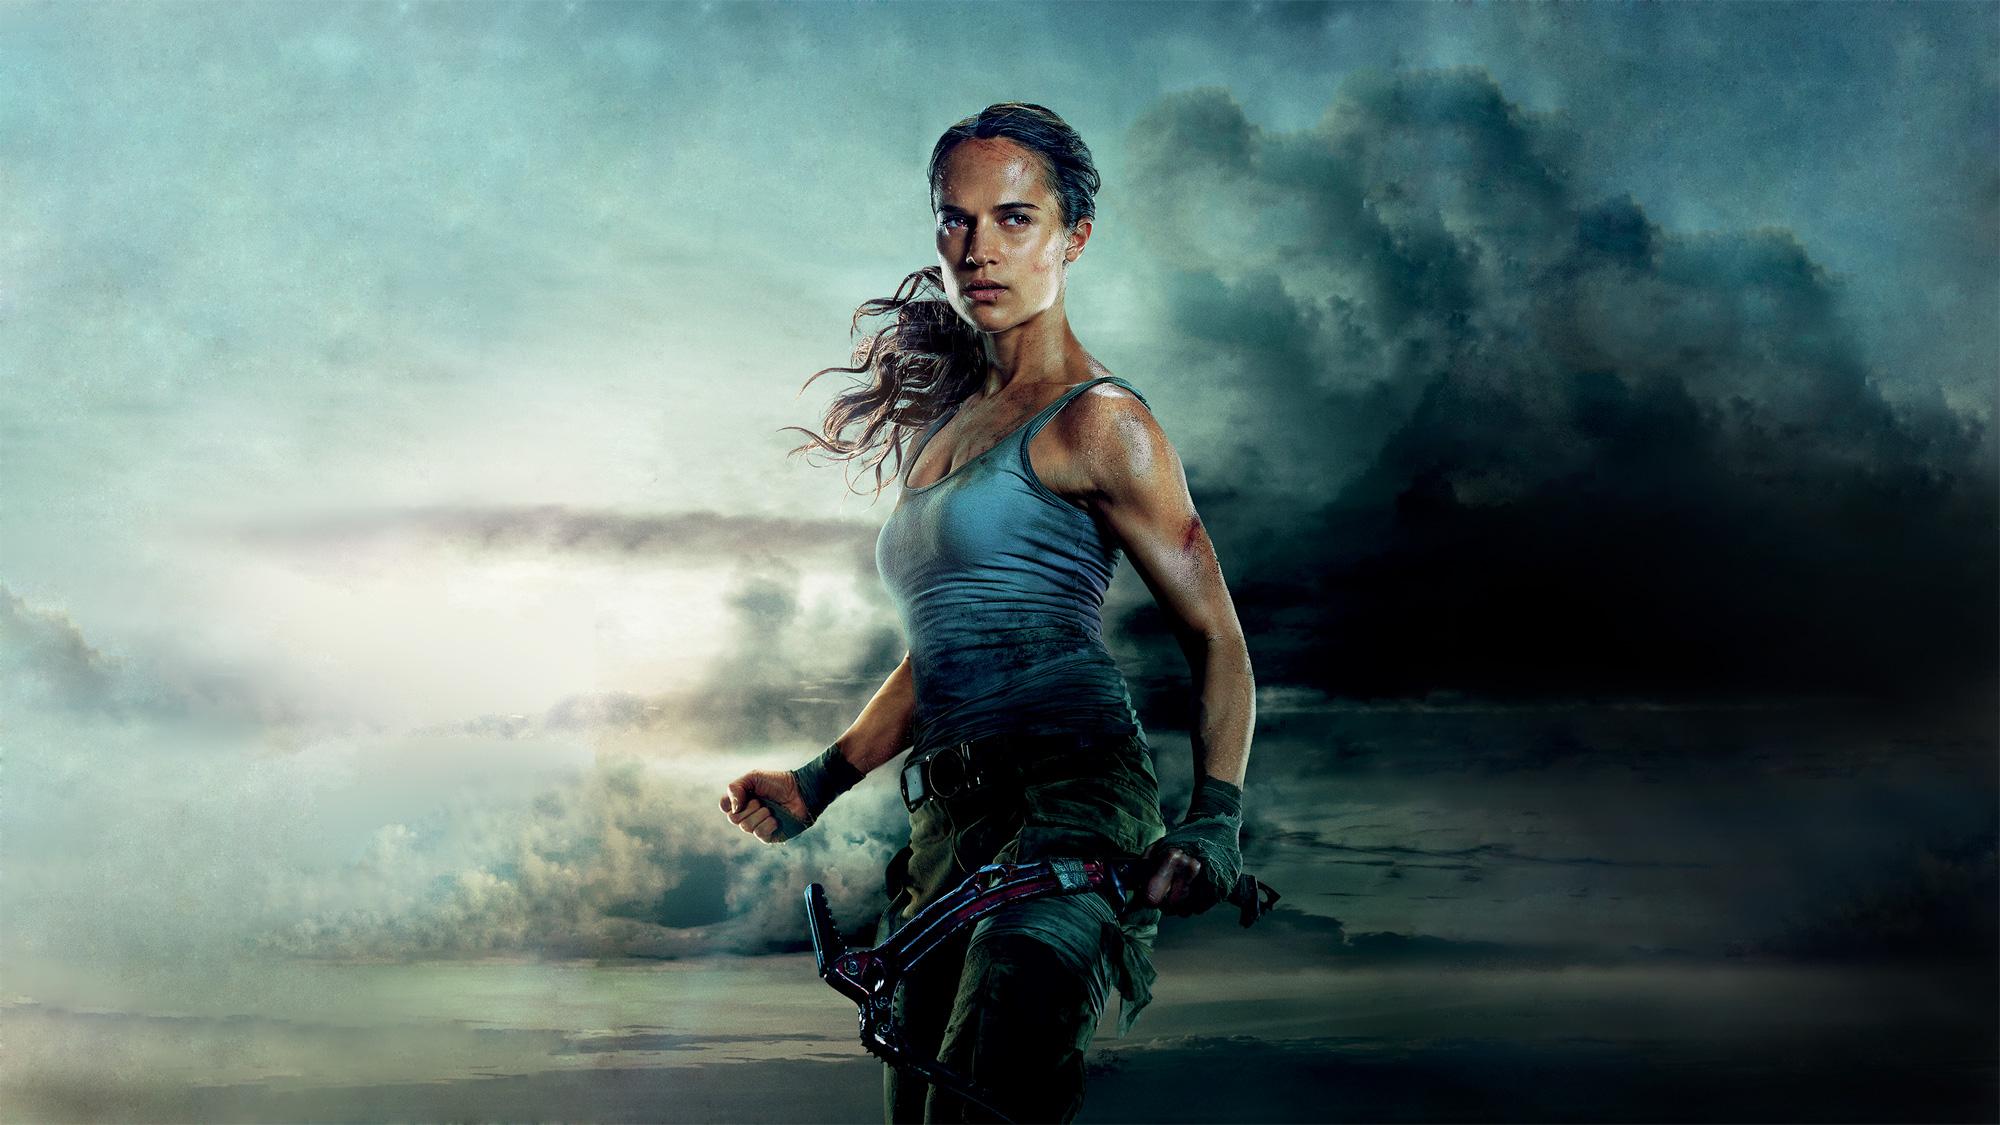 7680x4320 Lara Croft 8k Artwork 8k Hd 4k Wallpapers: Fondos De Pantalla Tomb Raider 2018, Wallpapers HD